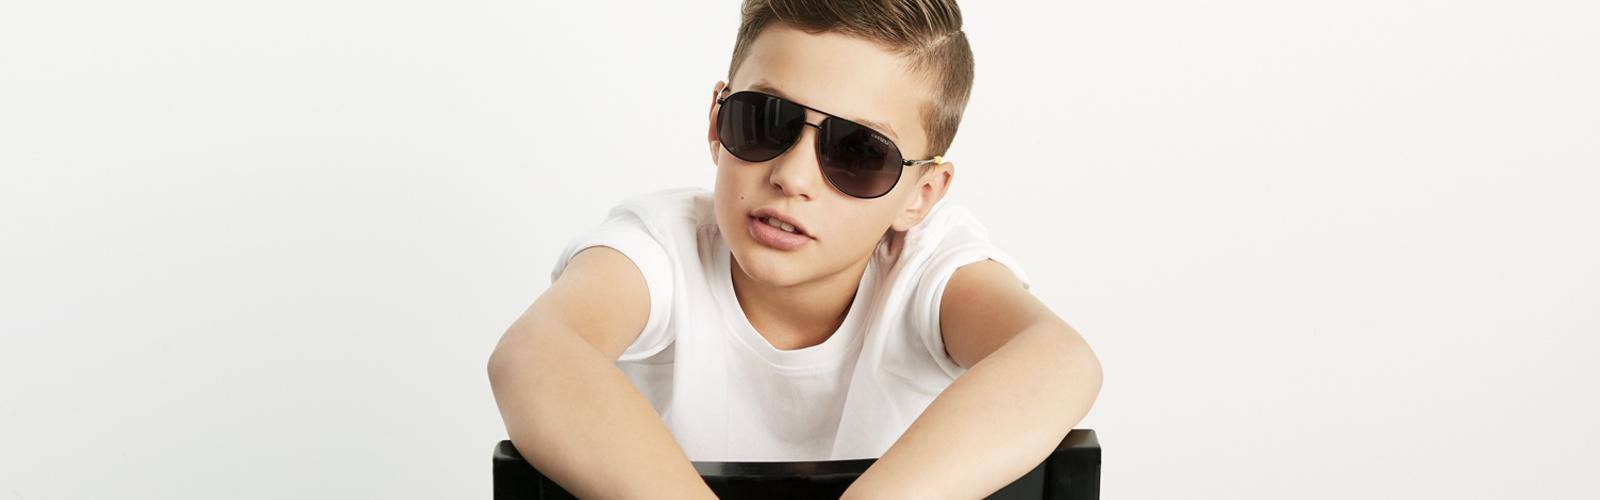 Boys Sunglasses